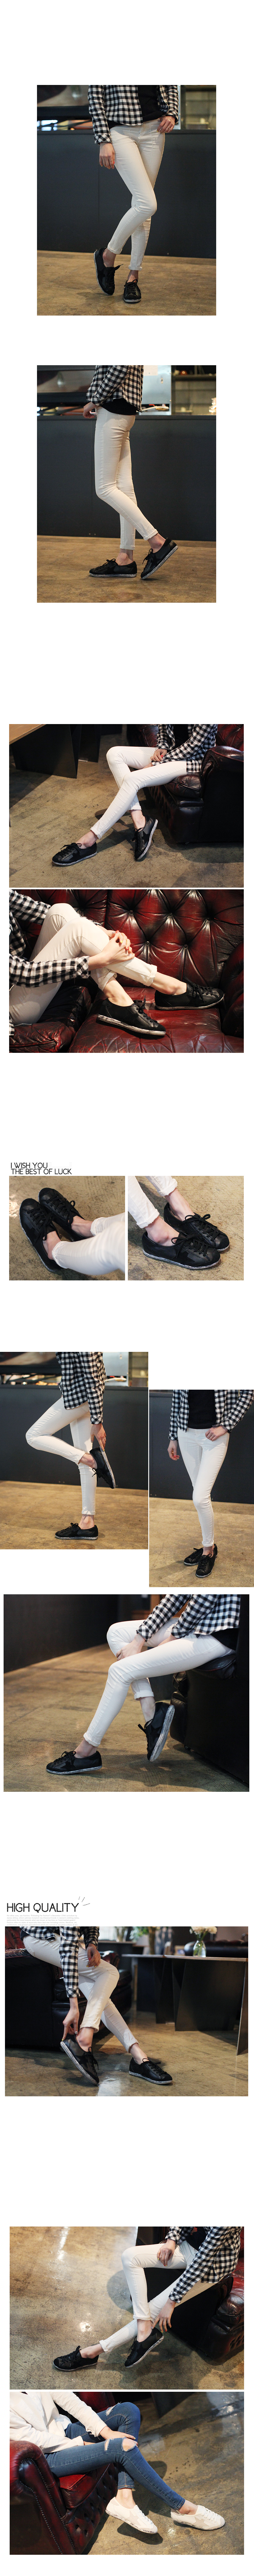 Hestine height adjustment sneakers 3cm